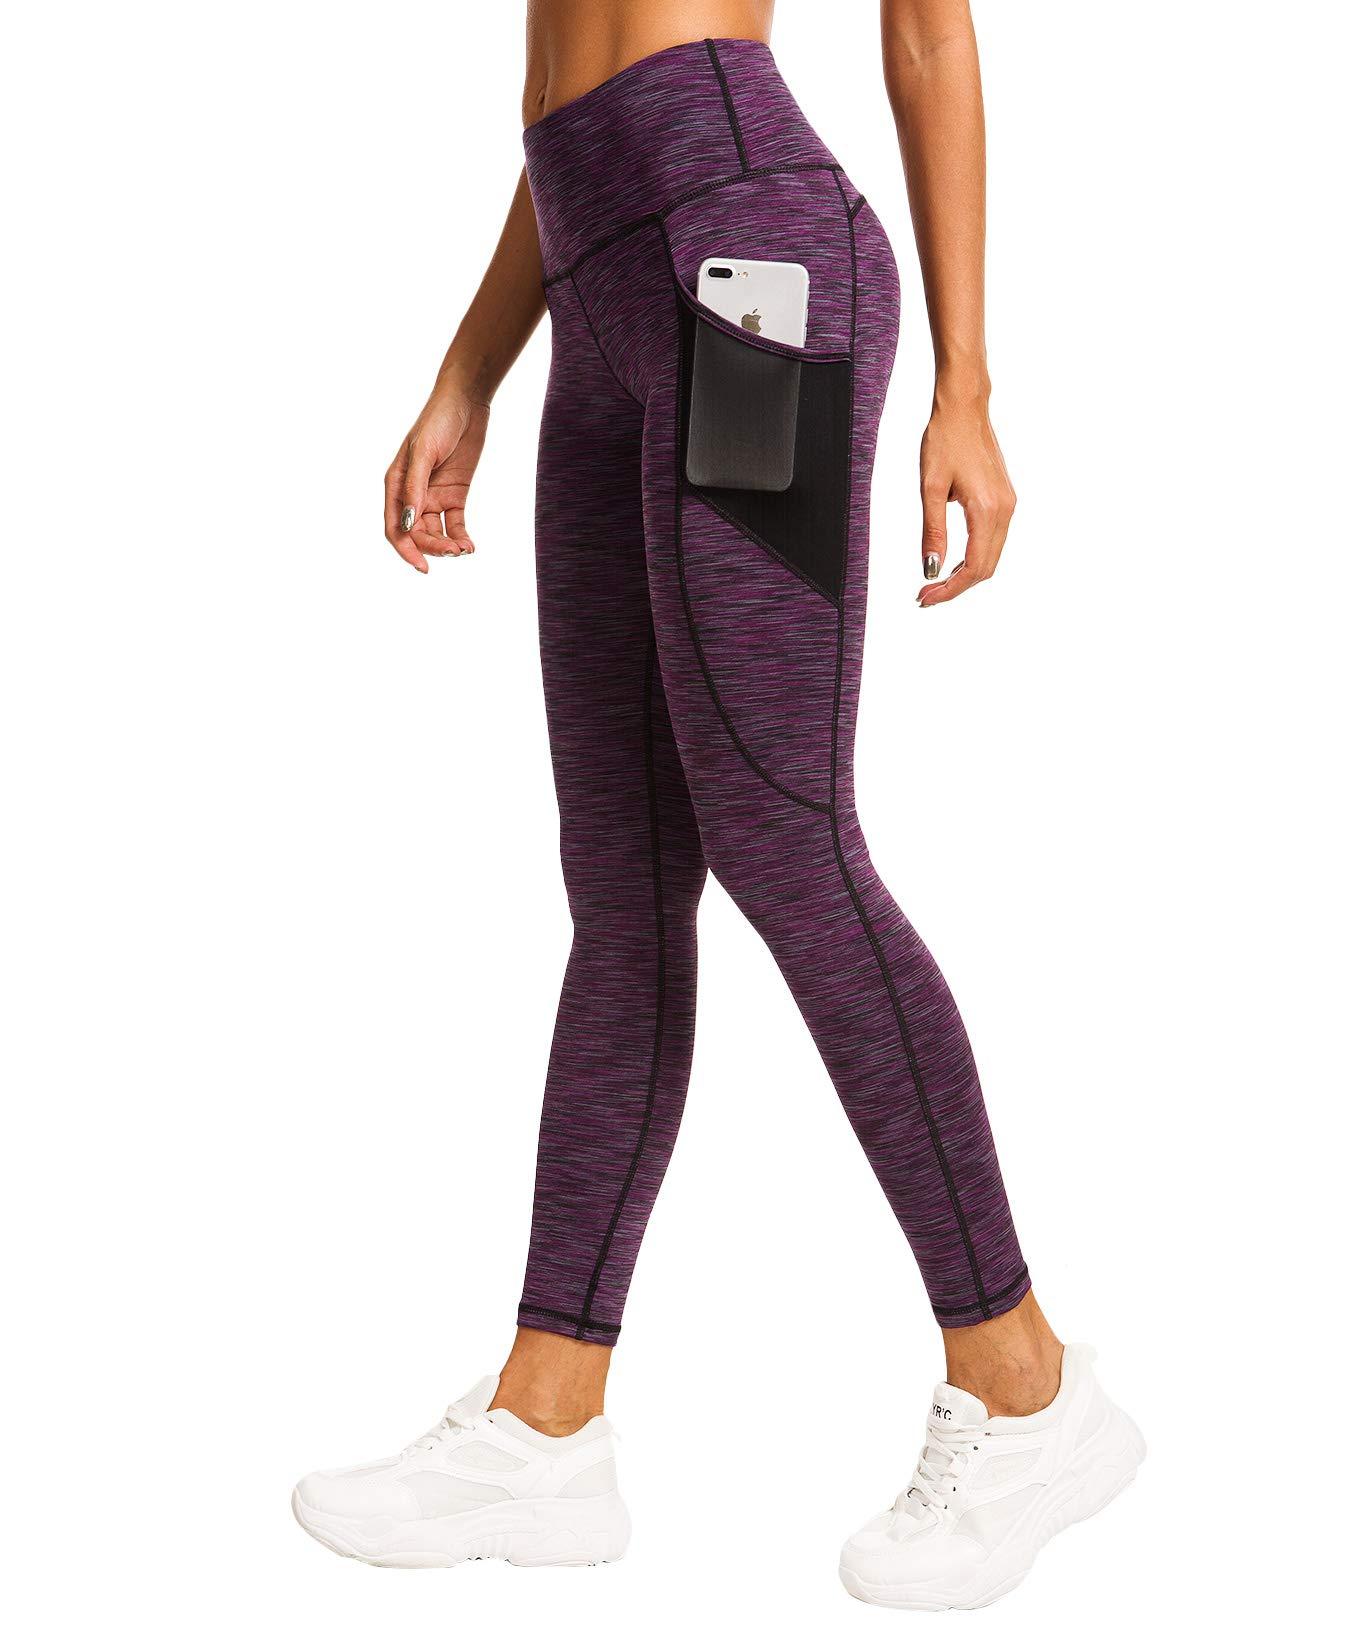 QUEENIEKE Women Peach Hip Yoga Leggings Power Flex Mesh Mid-Waist Gym Running Tights Size 4/6 Color 2019-Purple Space Dye